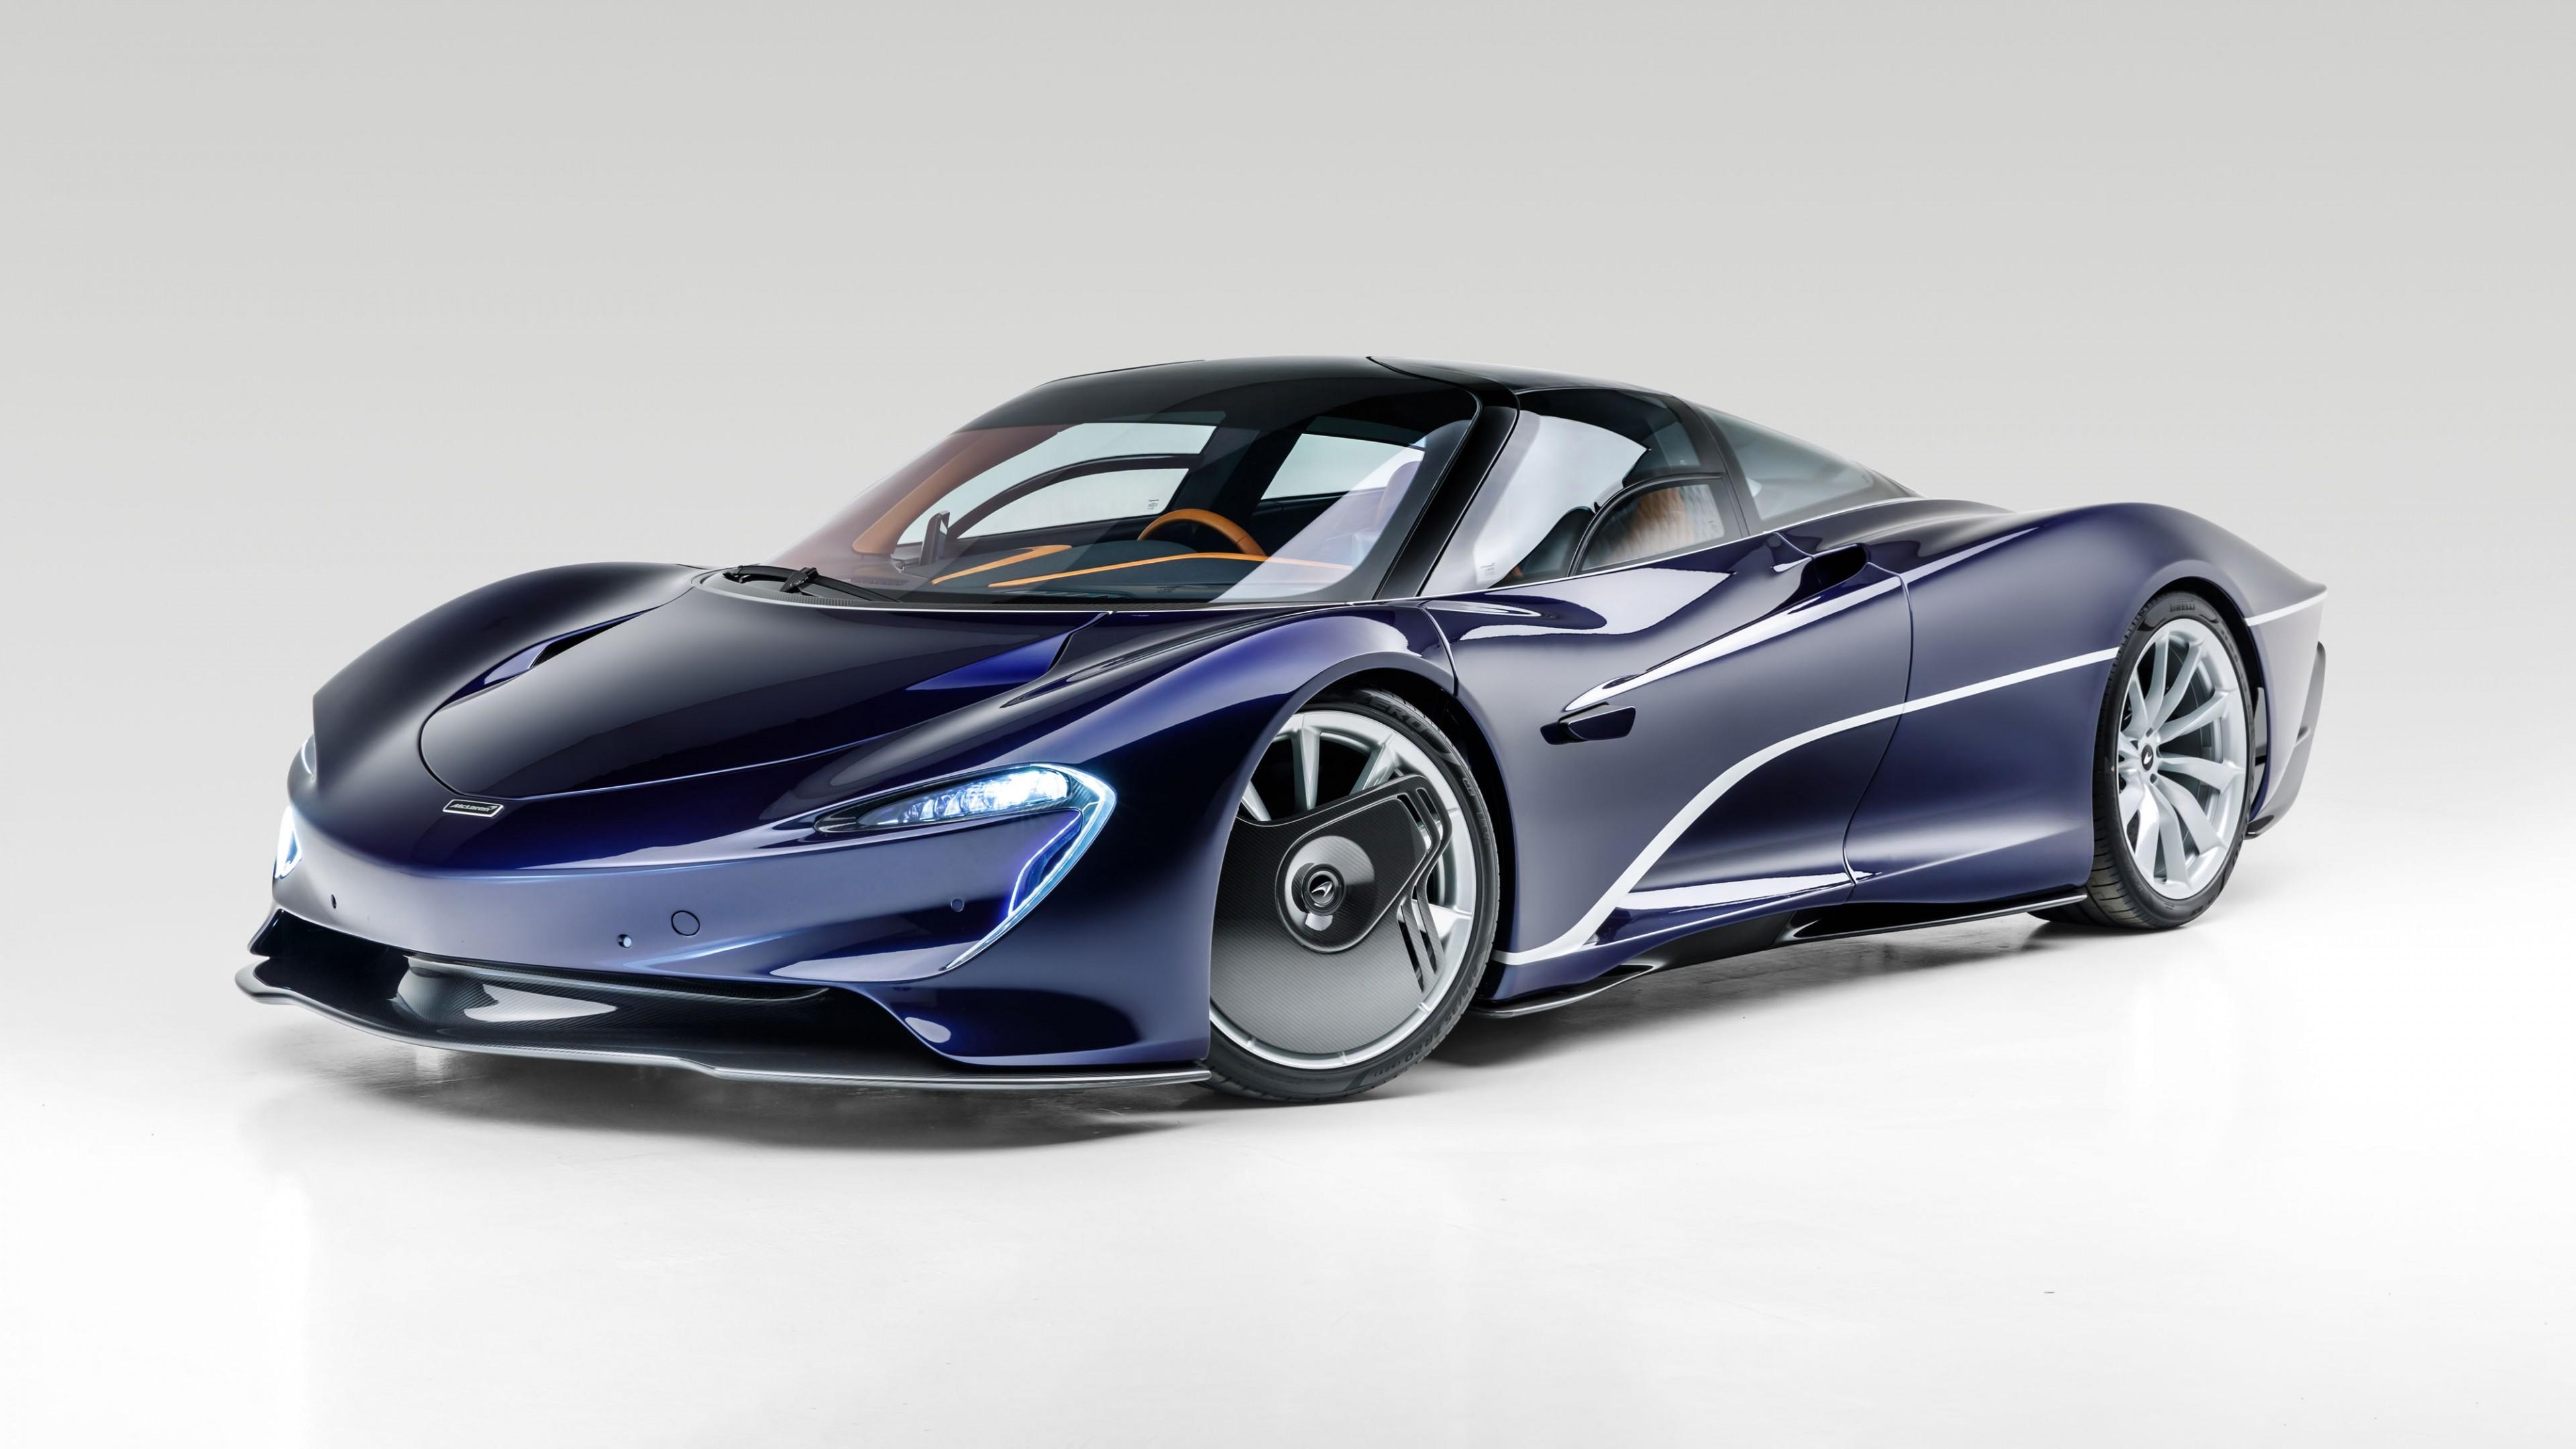 McLaren Speedtail 2021 4K 5 Wallpaper | HD Car Wallpapers ...